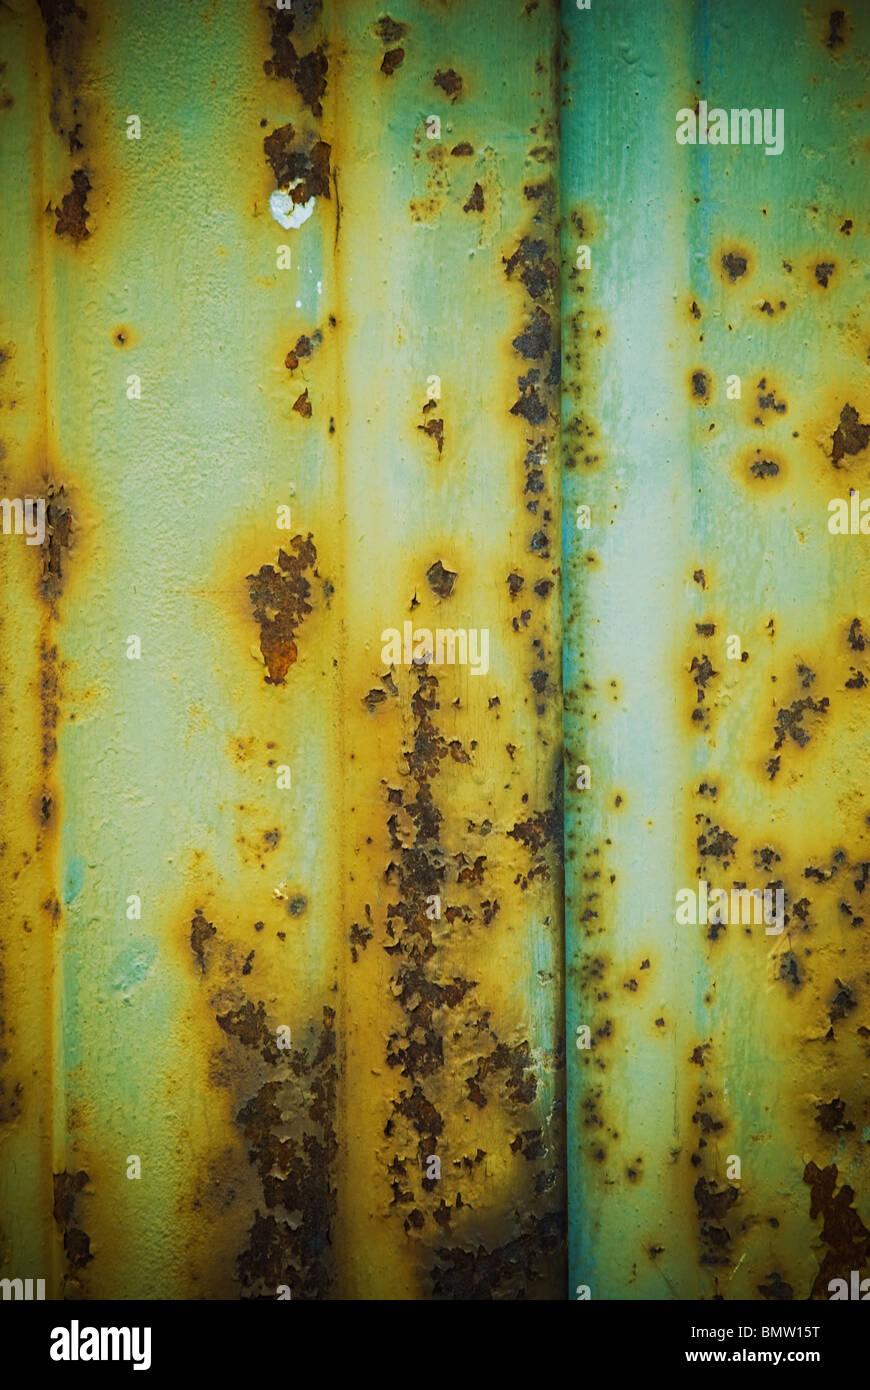 Résumé fond surface texture métal rouillé Photo Stock